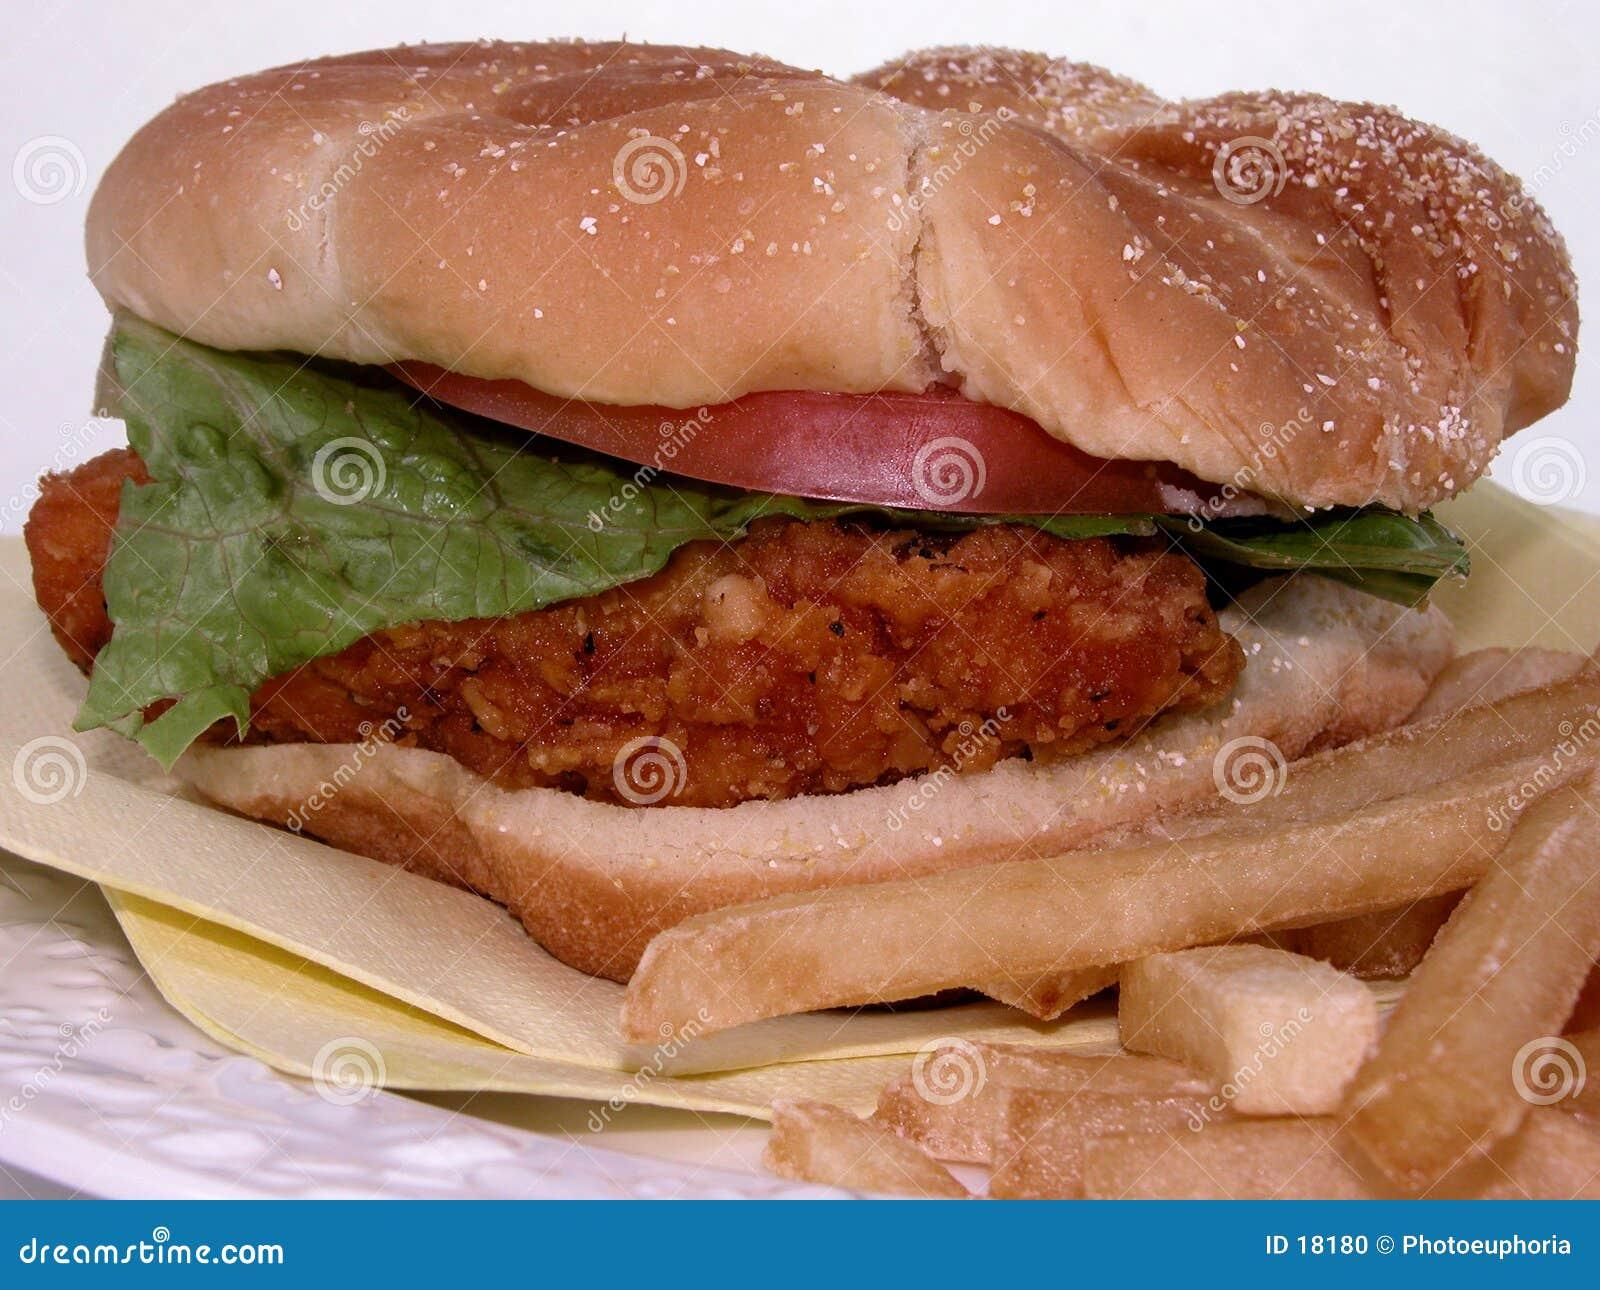 Alimento: Emparedado y fritadas de pollo frito